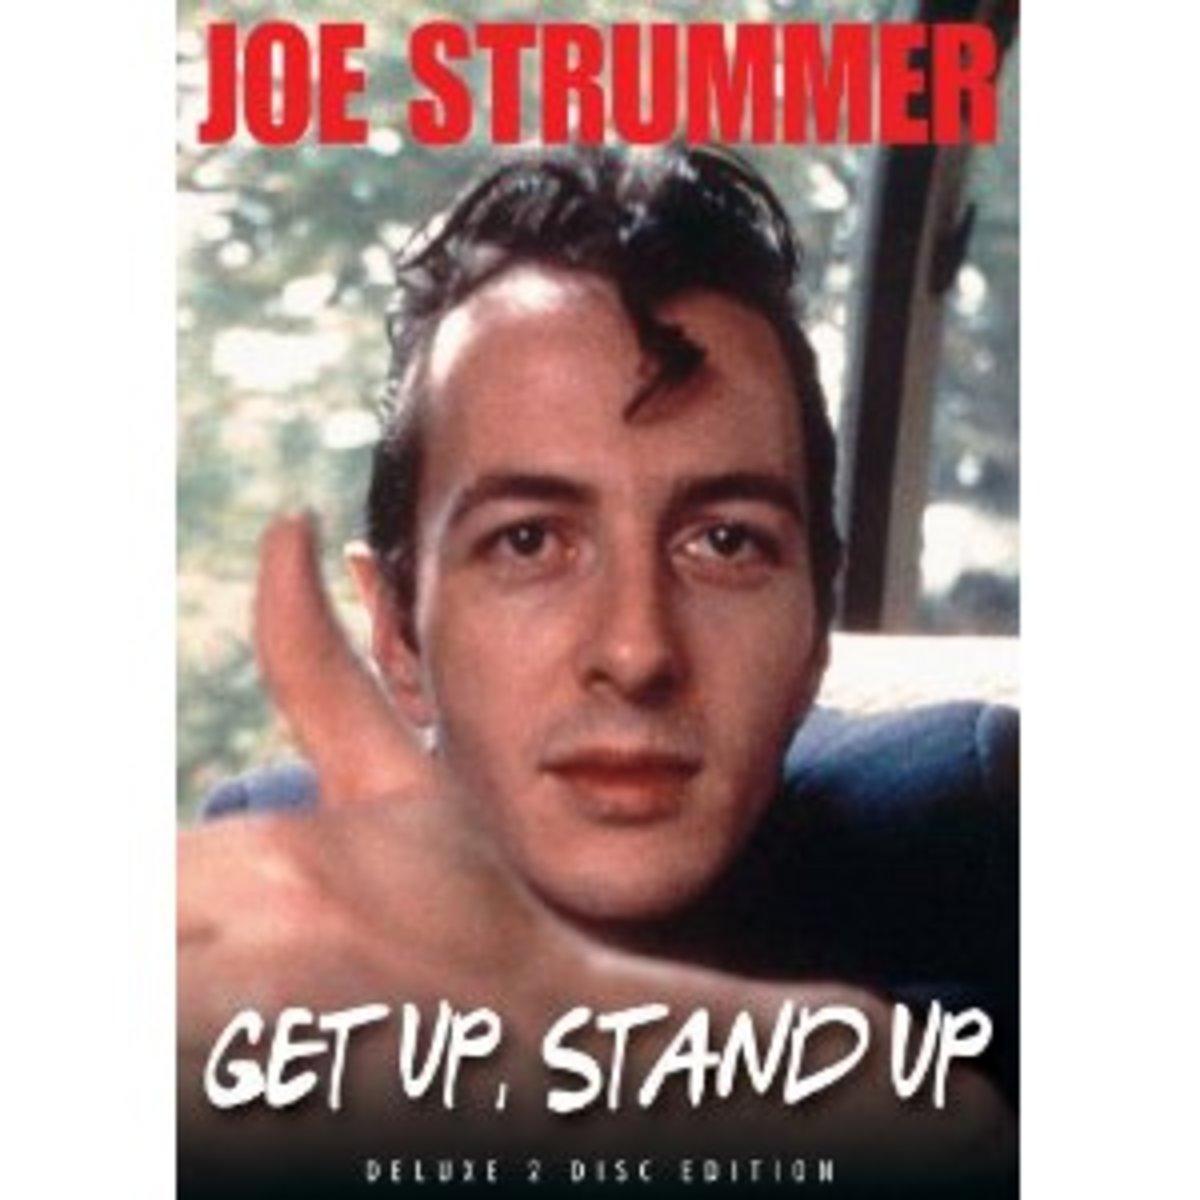 Joe Strummer Get Up, Stand Up DVD cover